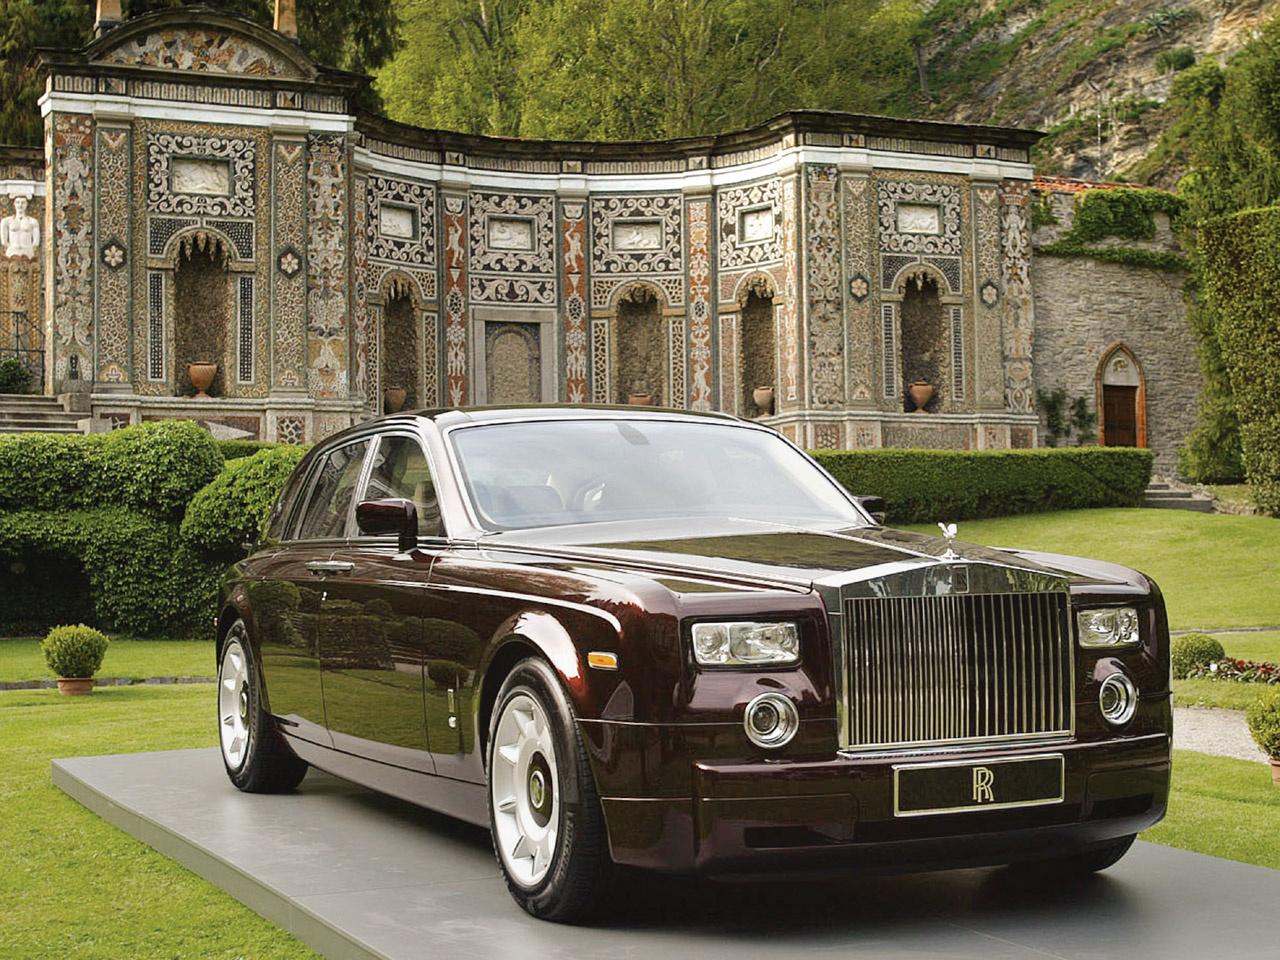 Rolls Royce Phantom Questions Price Of Rolls Royce Cargurus